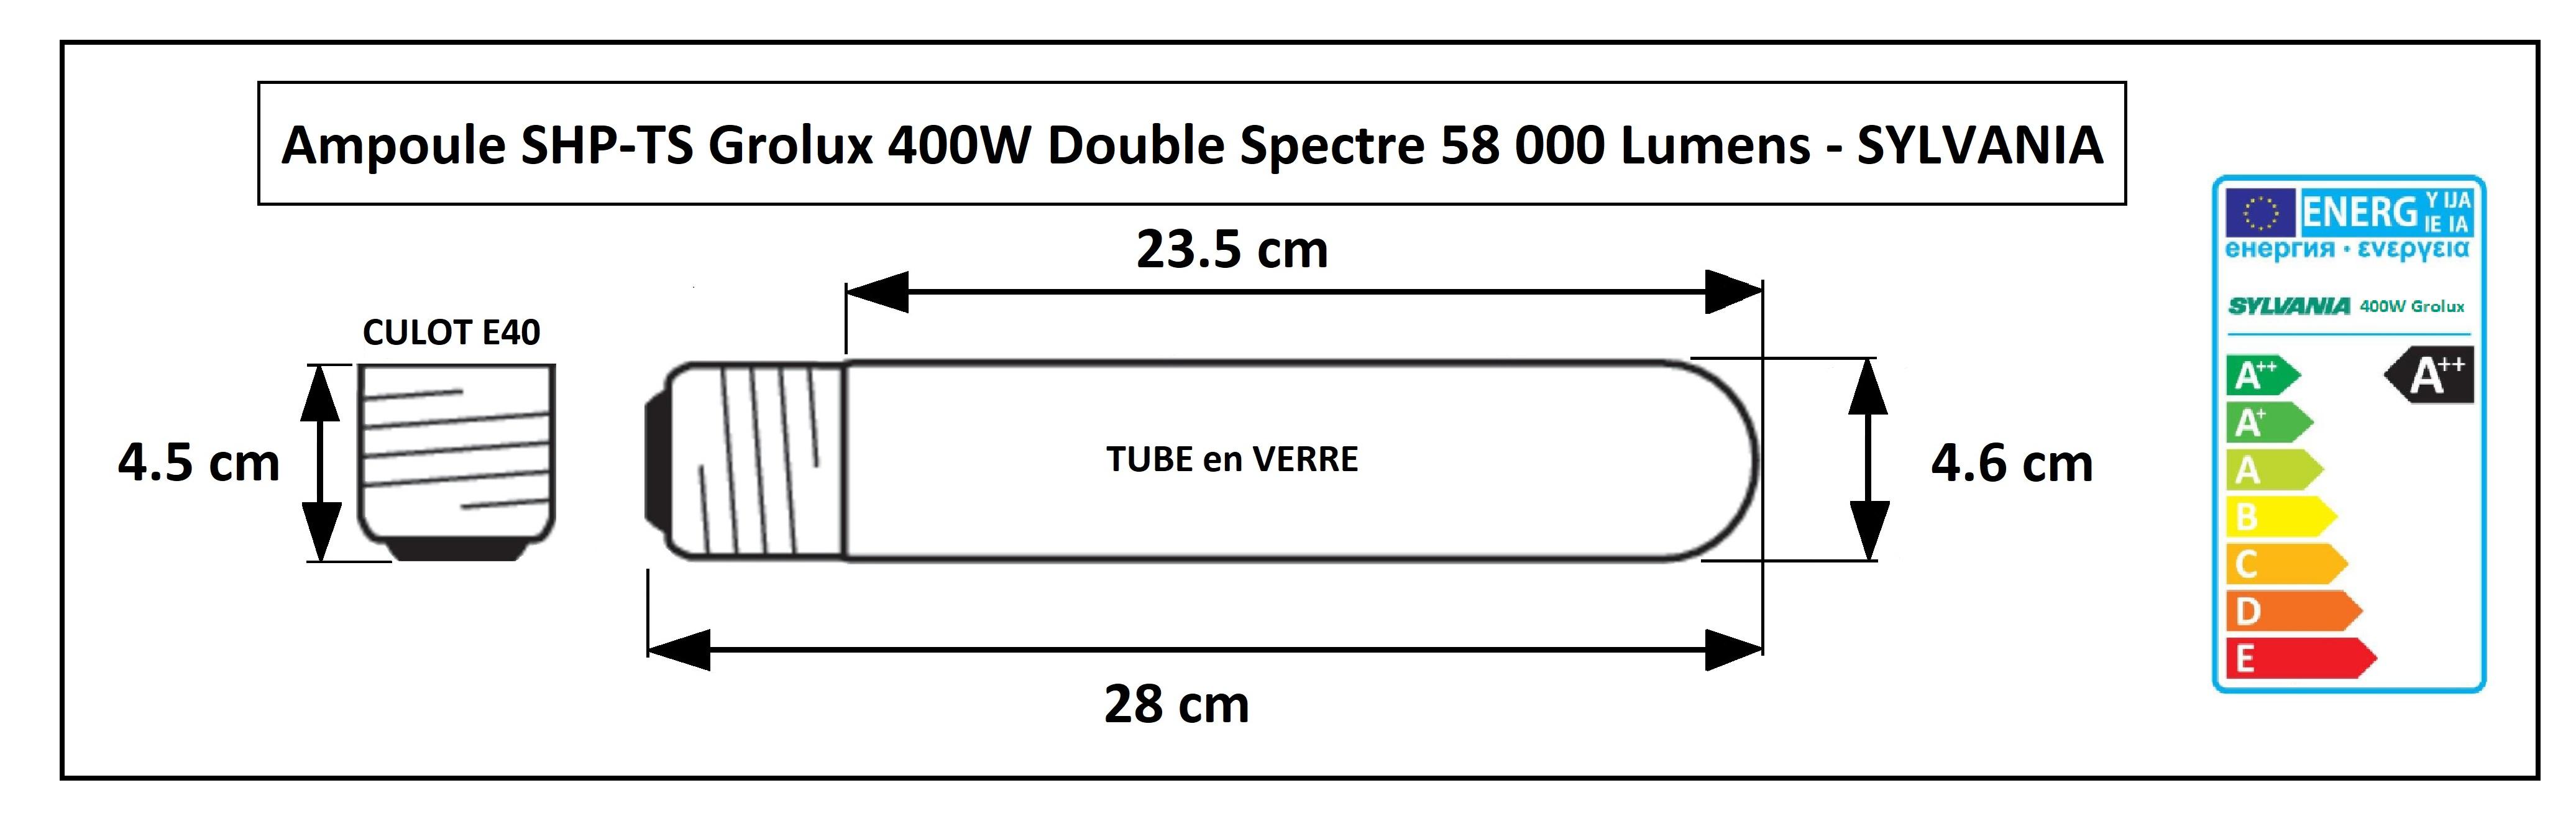 Dimensions de la lampe Agro 400W Sylvania Grolux